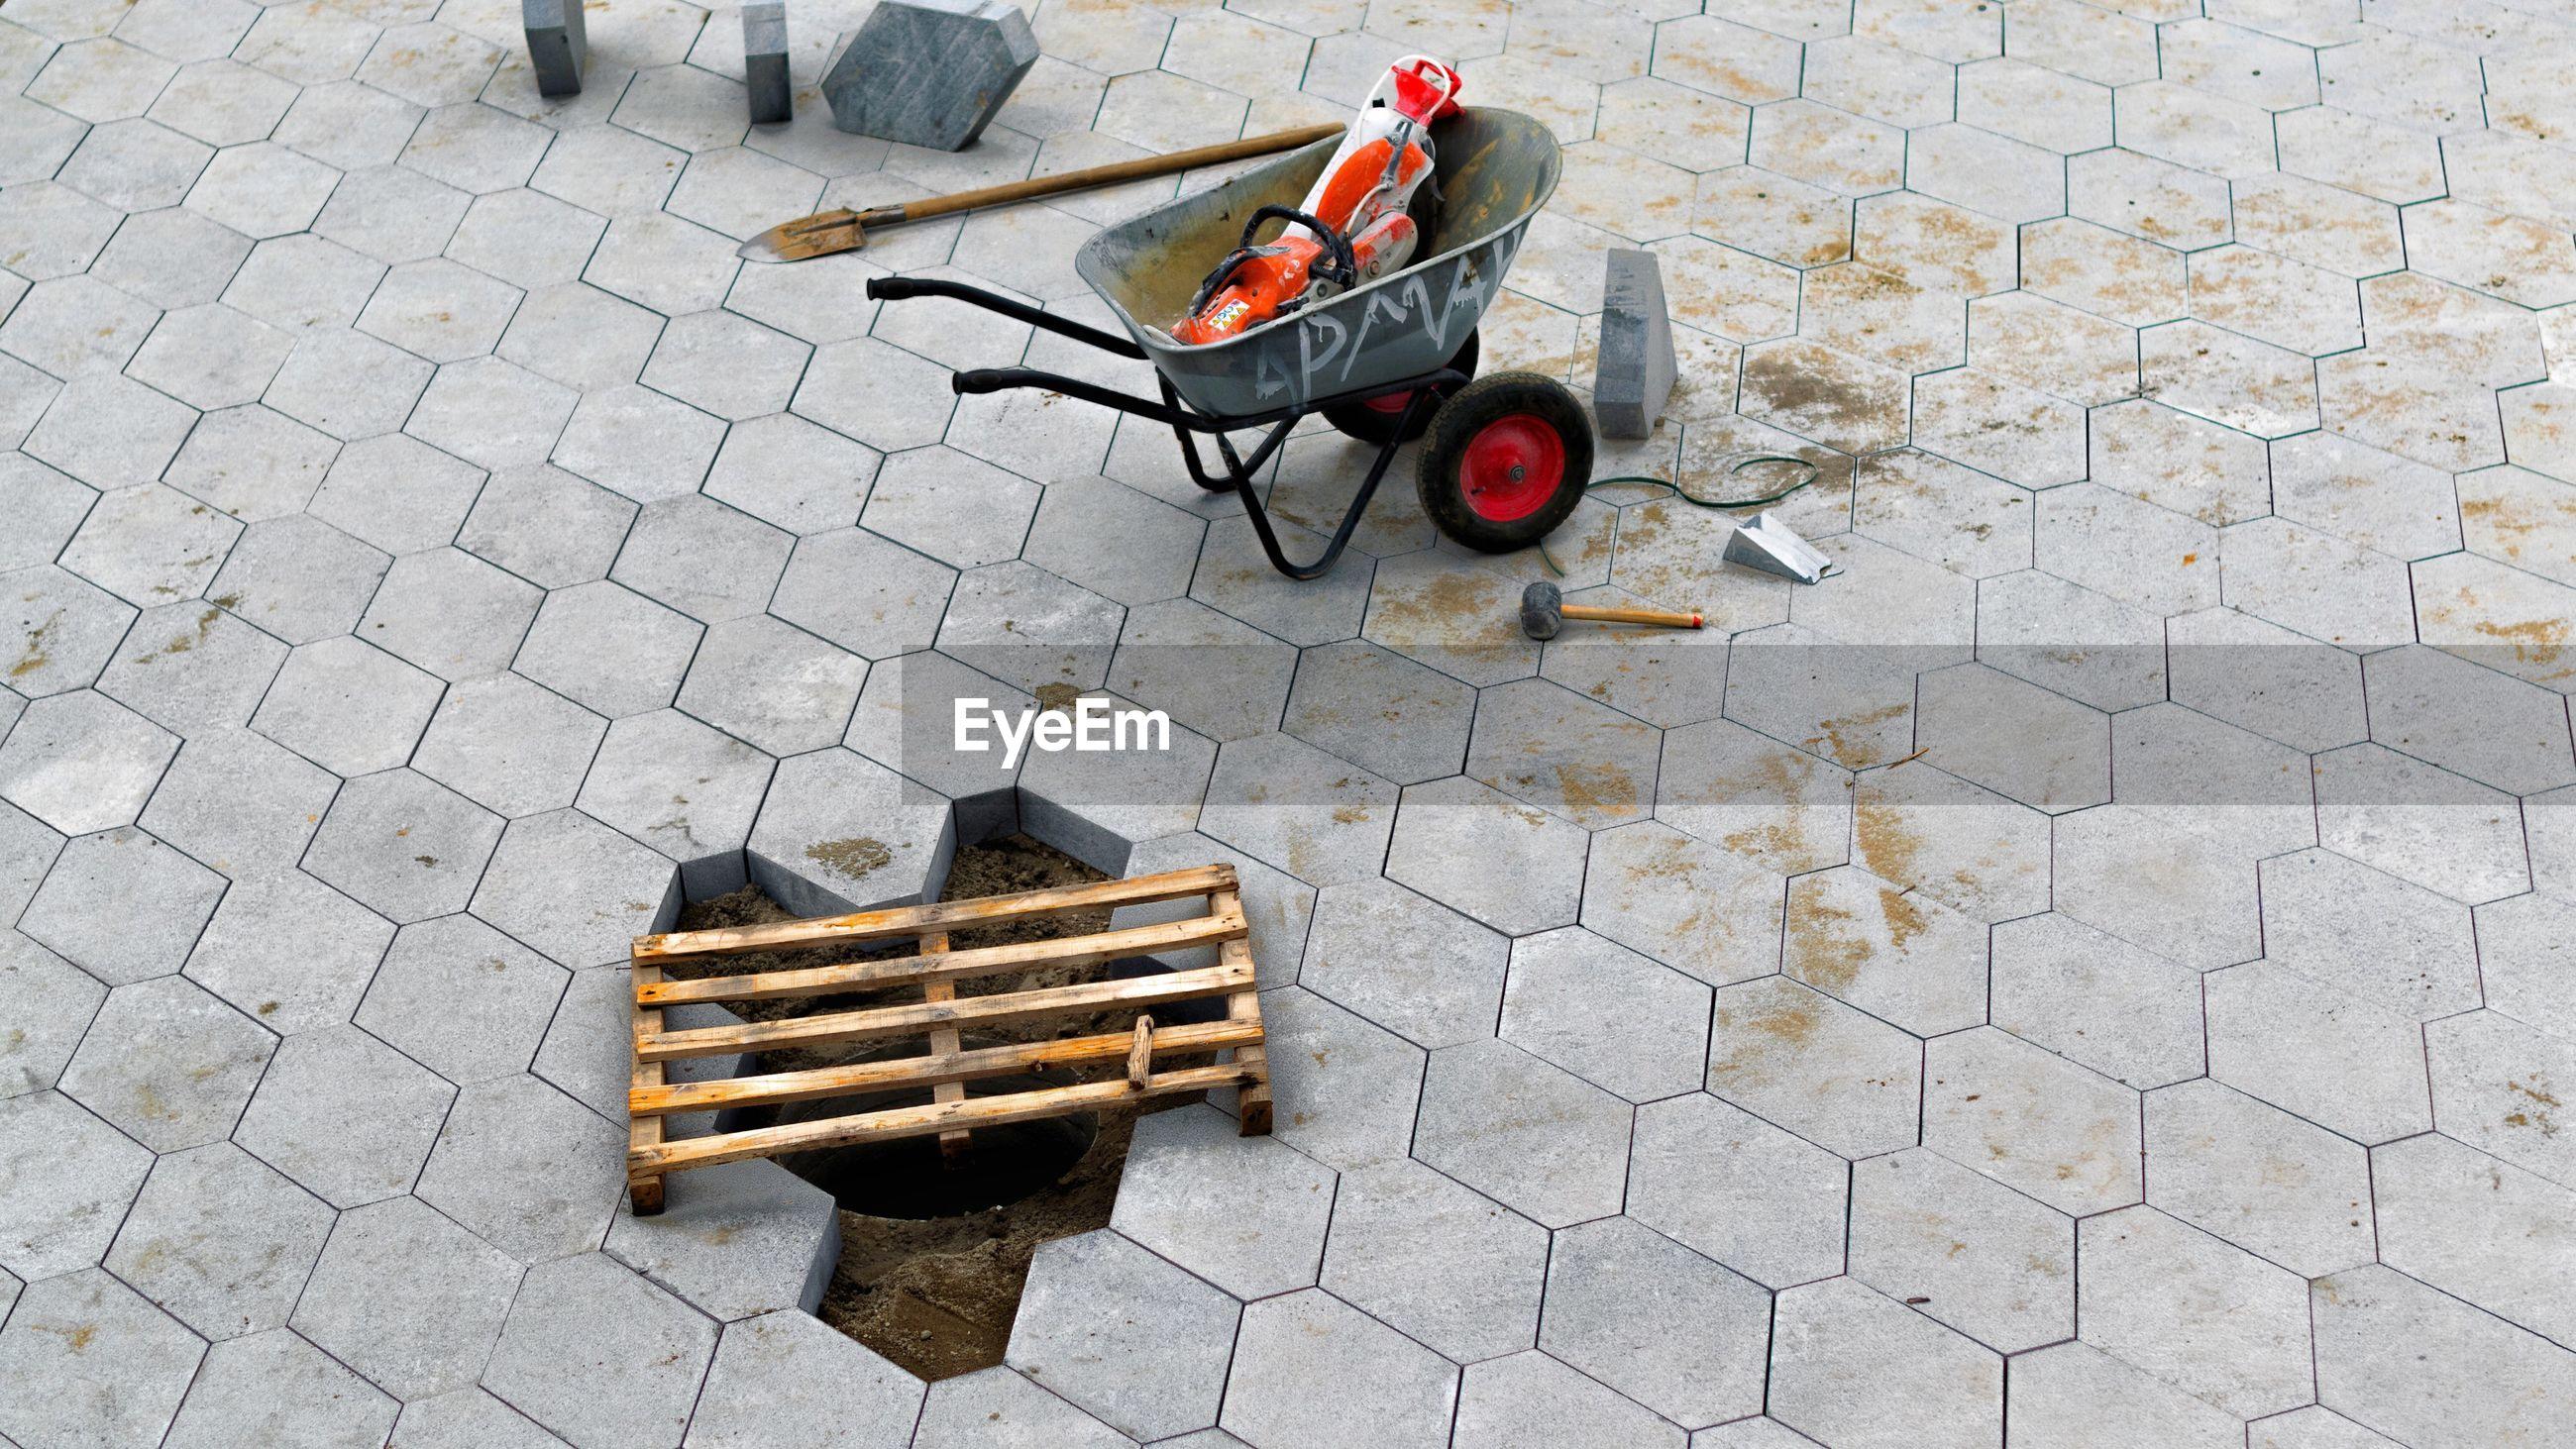 High angle view of wheelbarrow and work tools on street